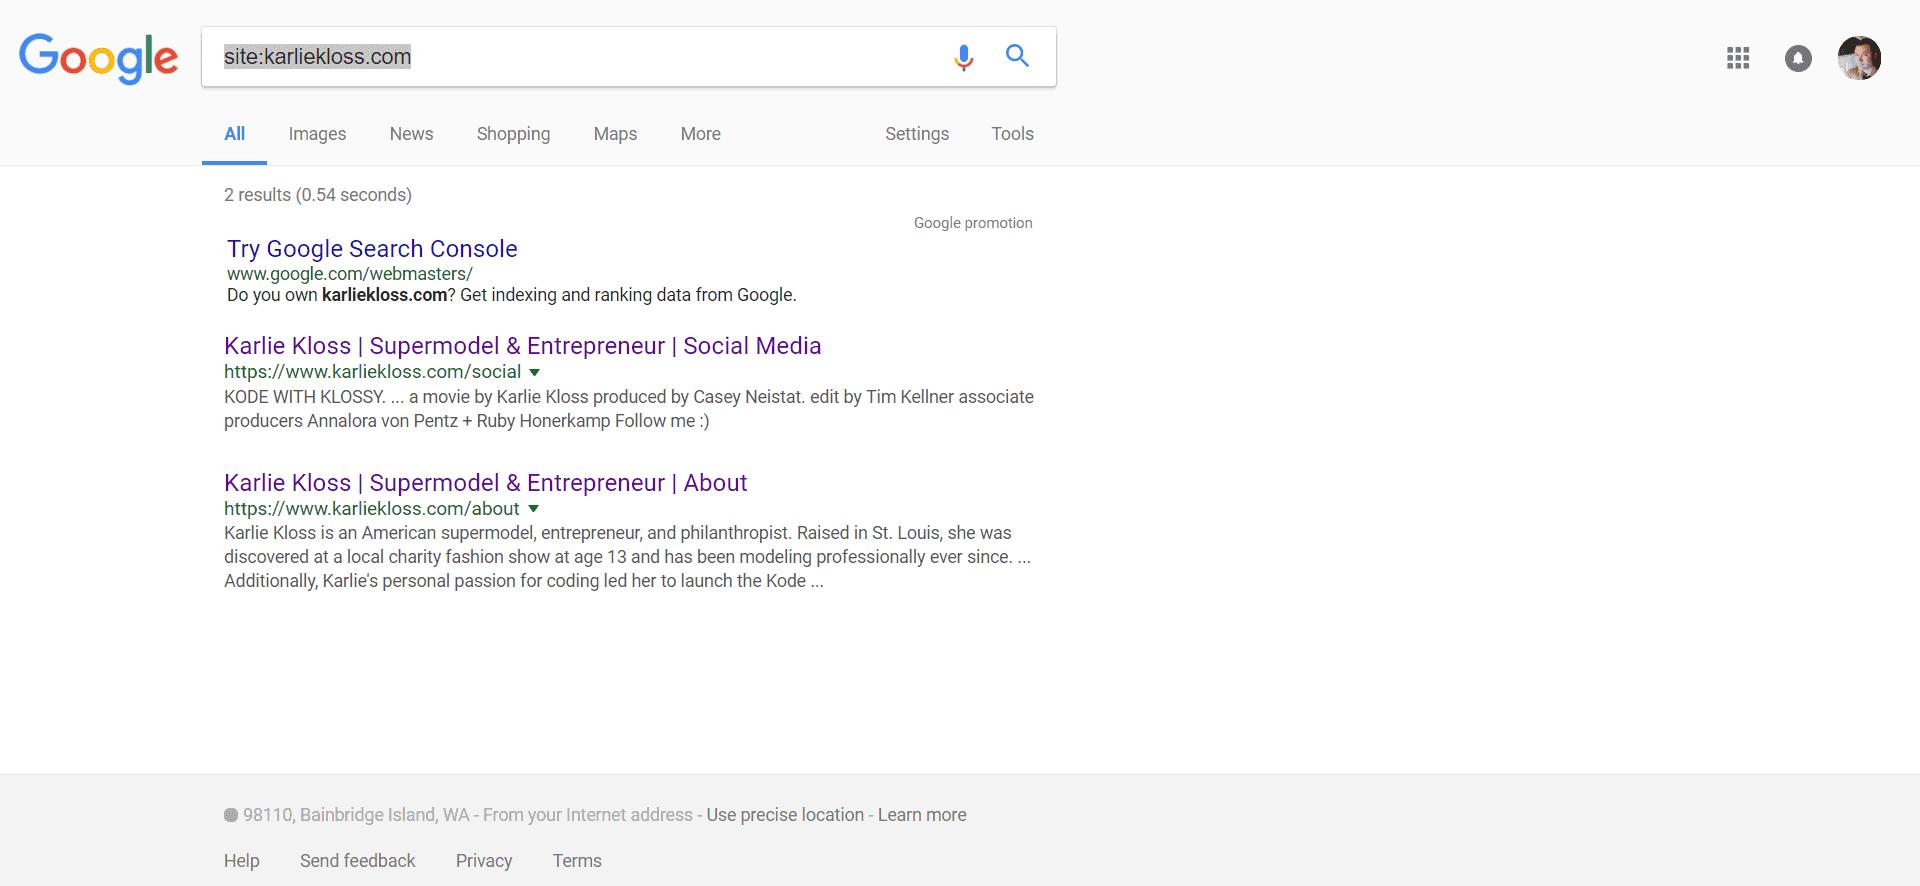 Google de-indexing karliekloss.com